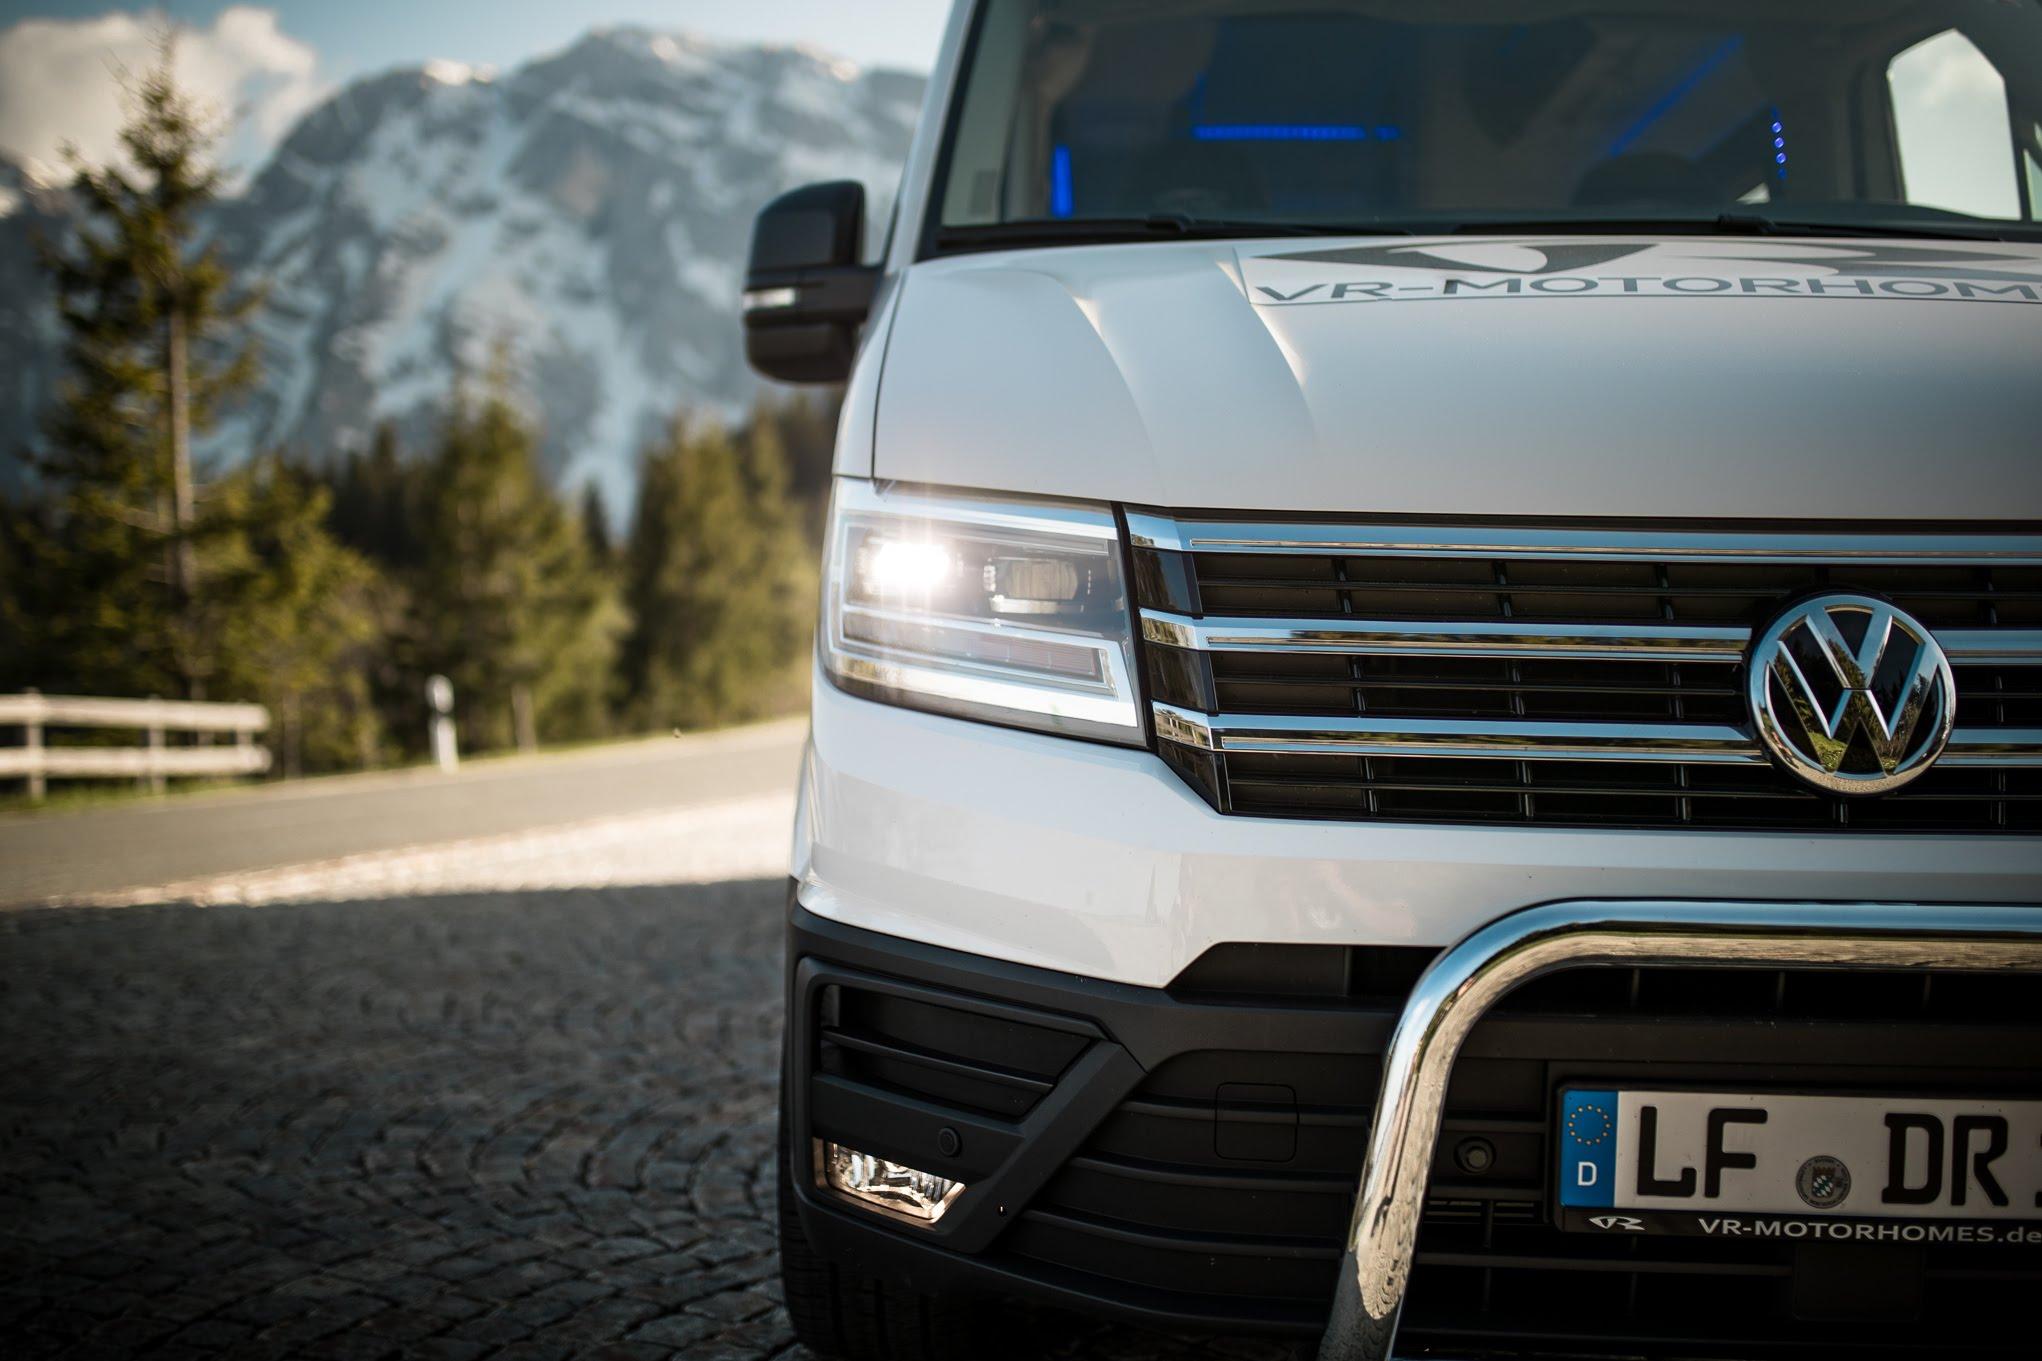 volkswagen new vw crafter 2018 2019 2020 led tagfahrlicht  vr motorhomes l4h3 l5h3 gfk superhochdach